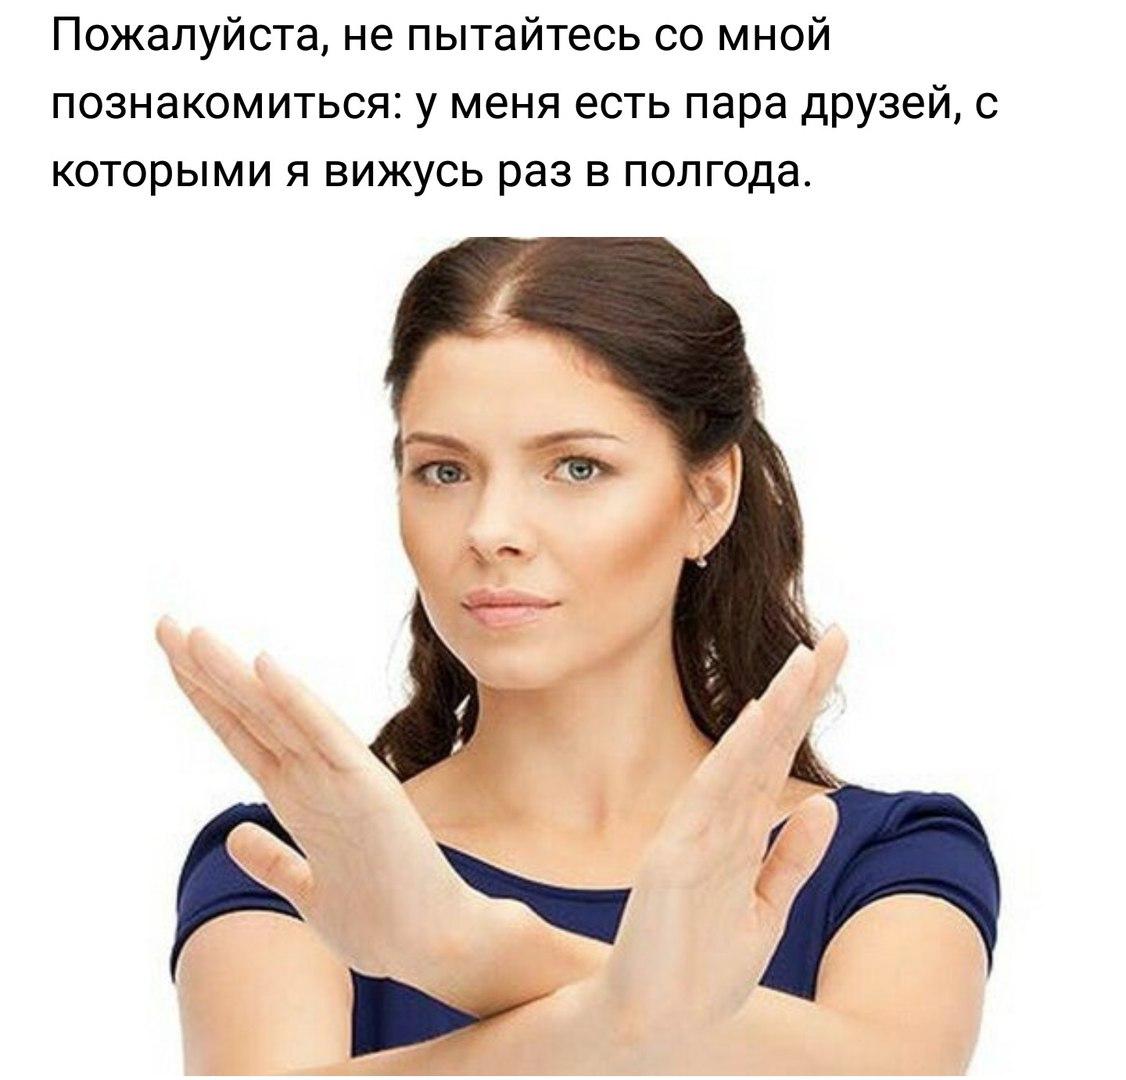 https://pp.userapi.com/c540100/v540100111/41315/bdS3qT45jWo.jpg